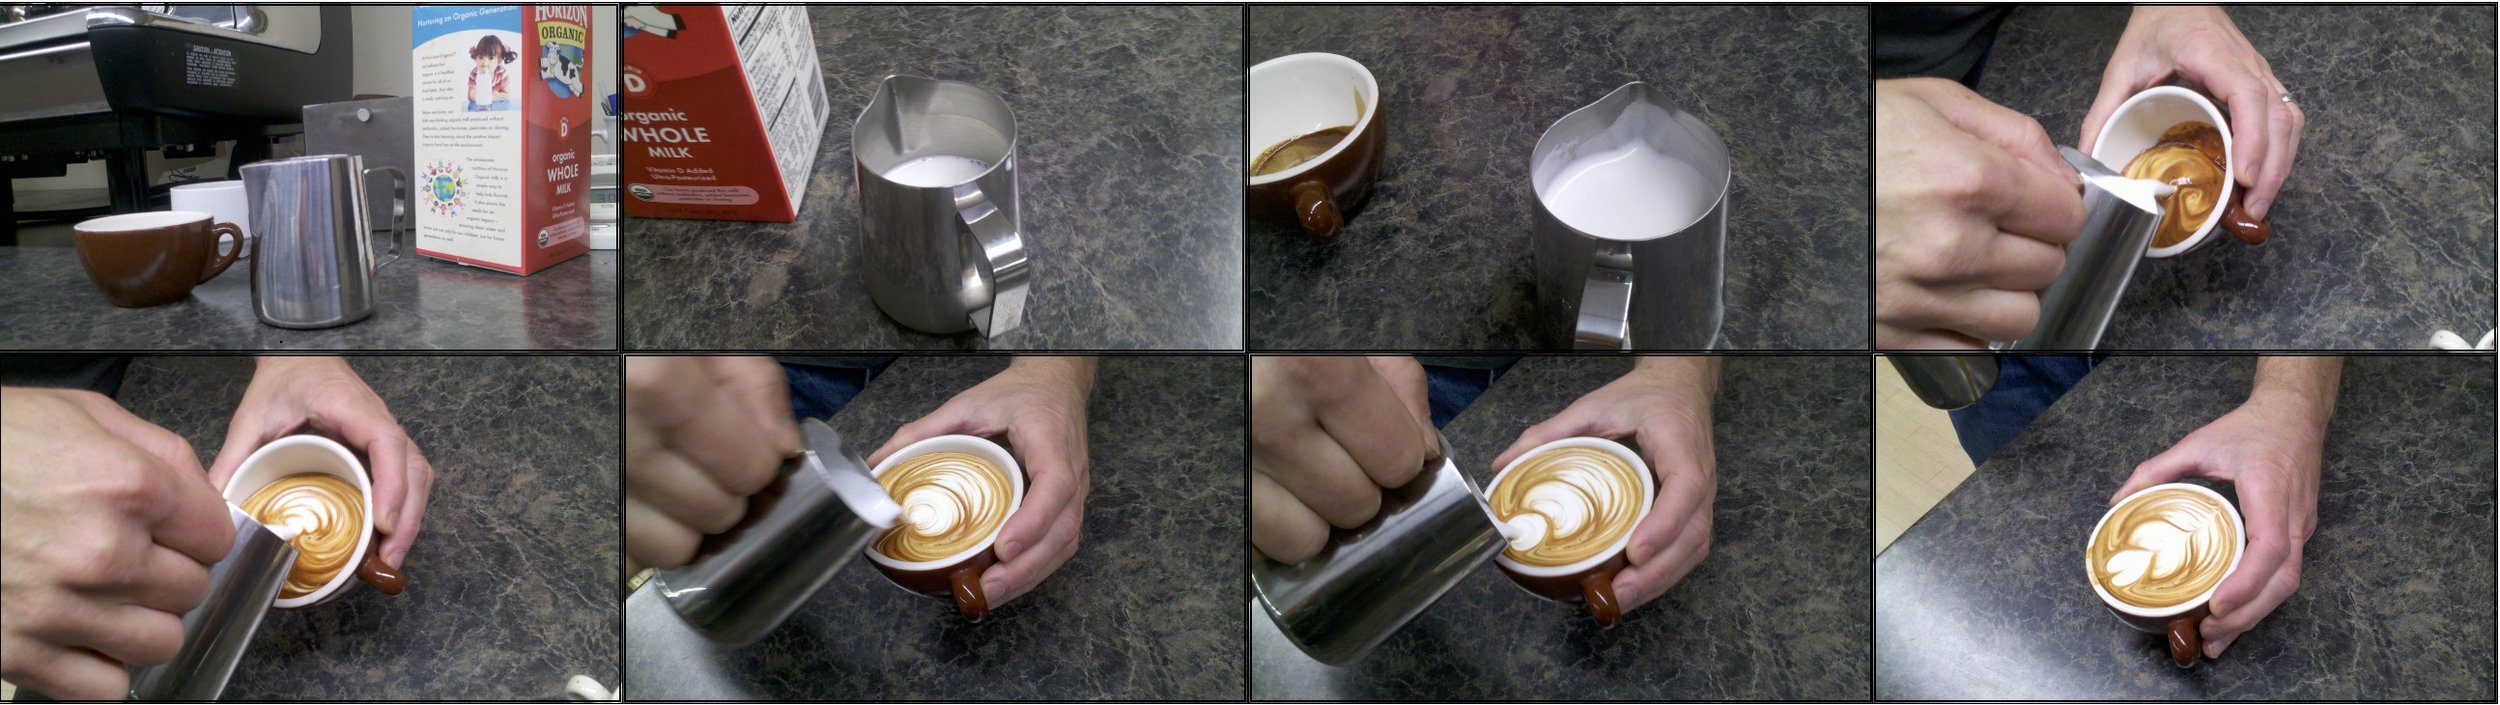 Latte Art Pitcher Demo.jpg